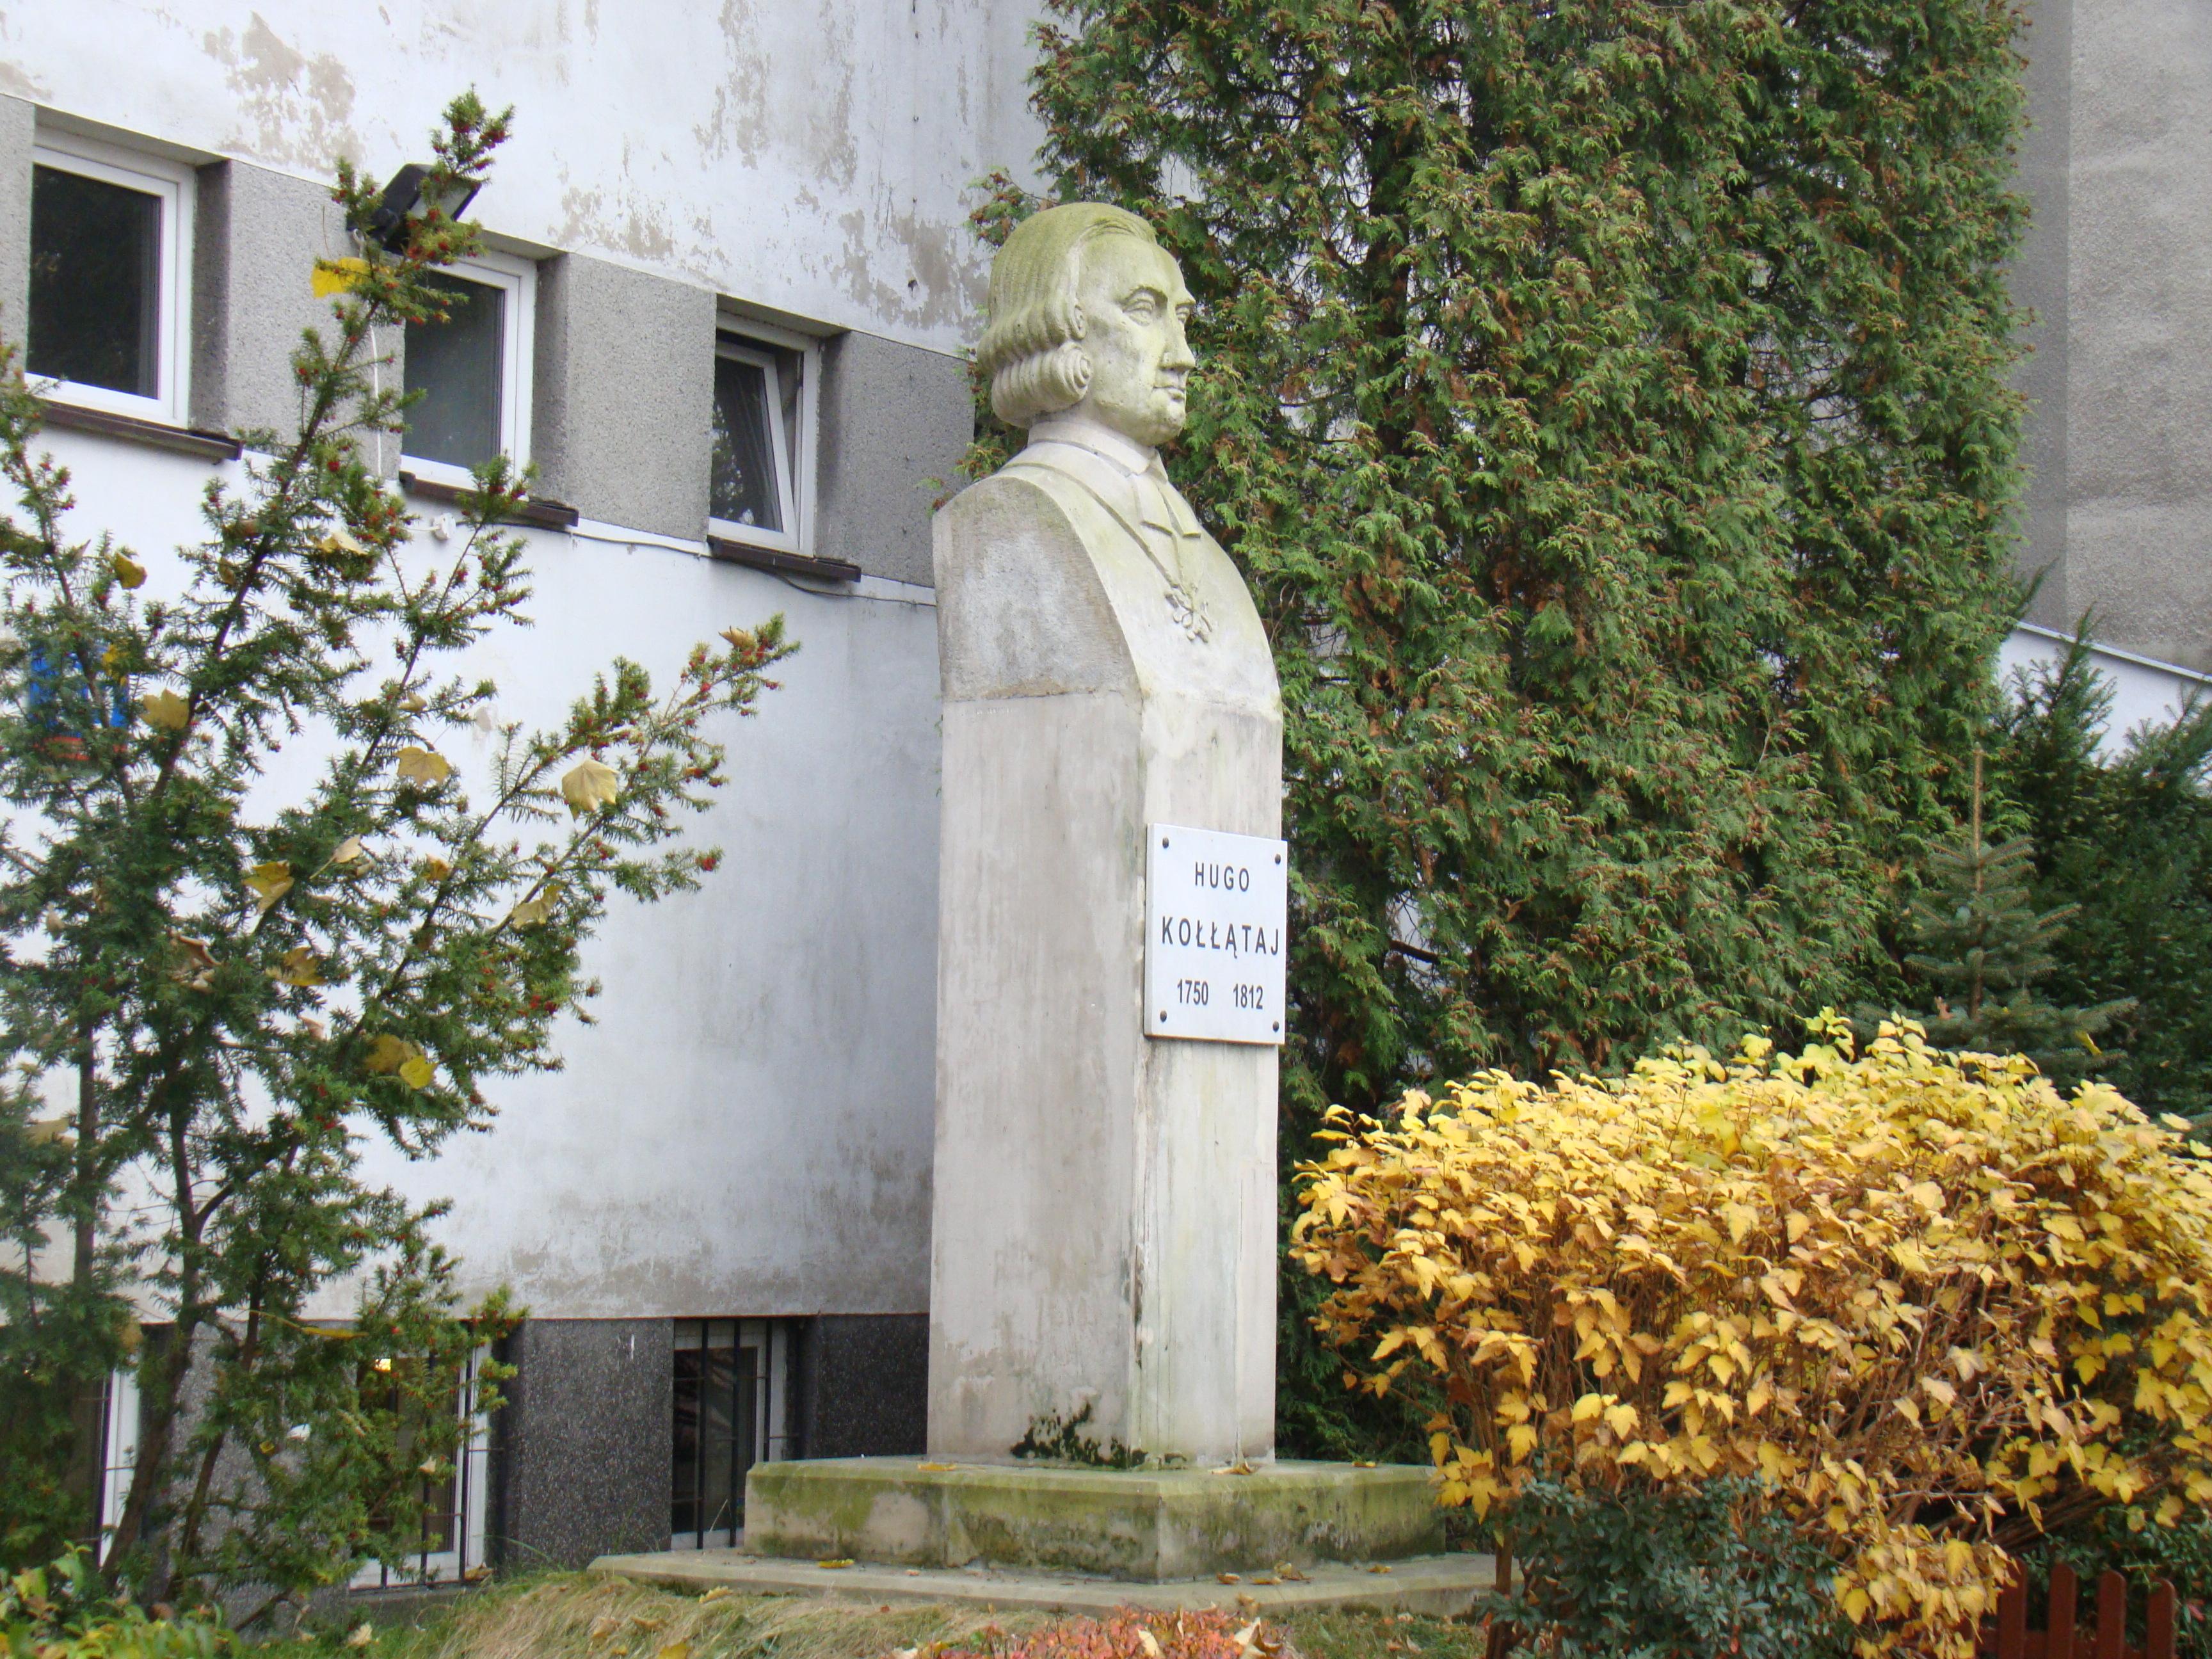 Pomnik Hugona Kołłątaja